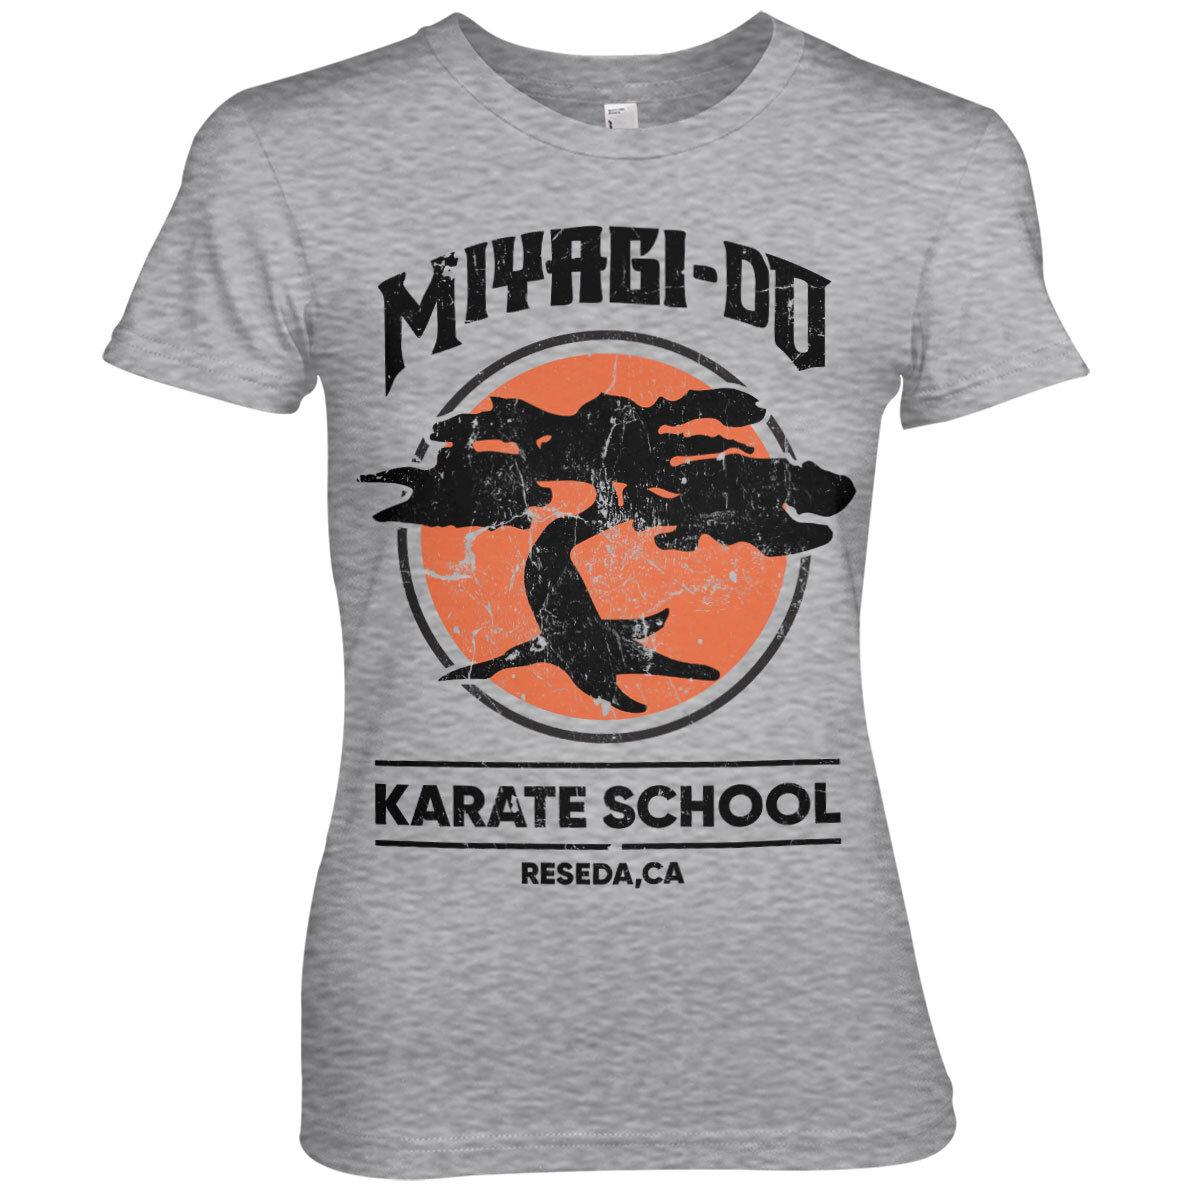 Miyagi-Do Karate School Girly Tee